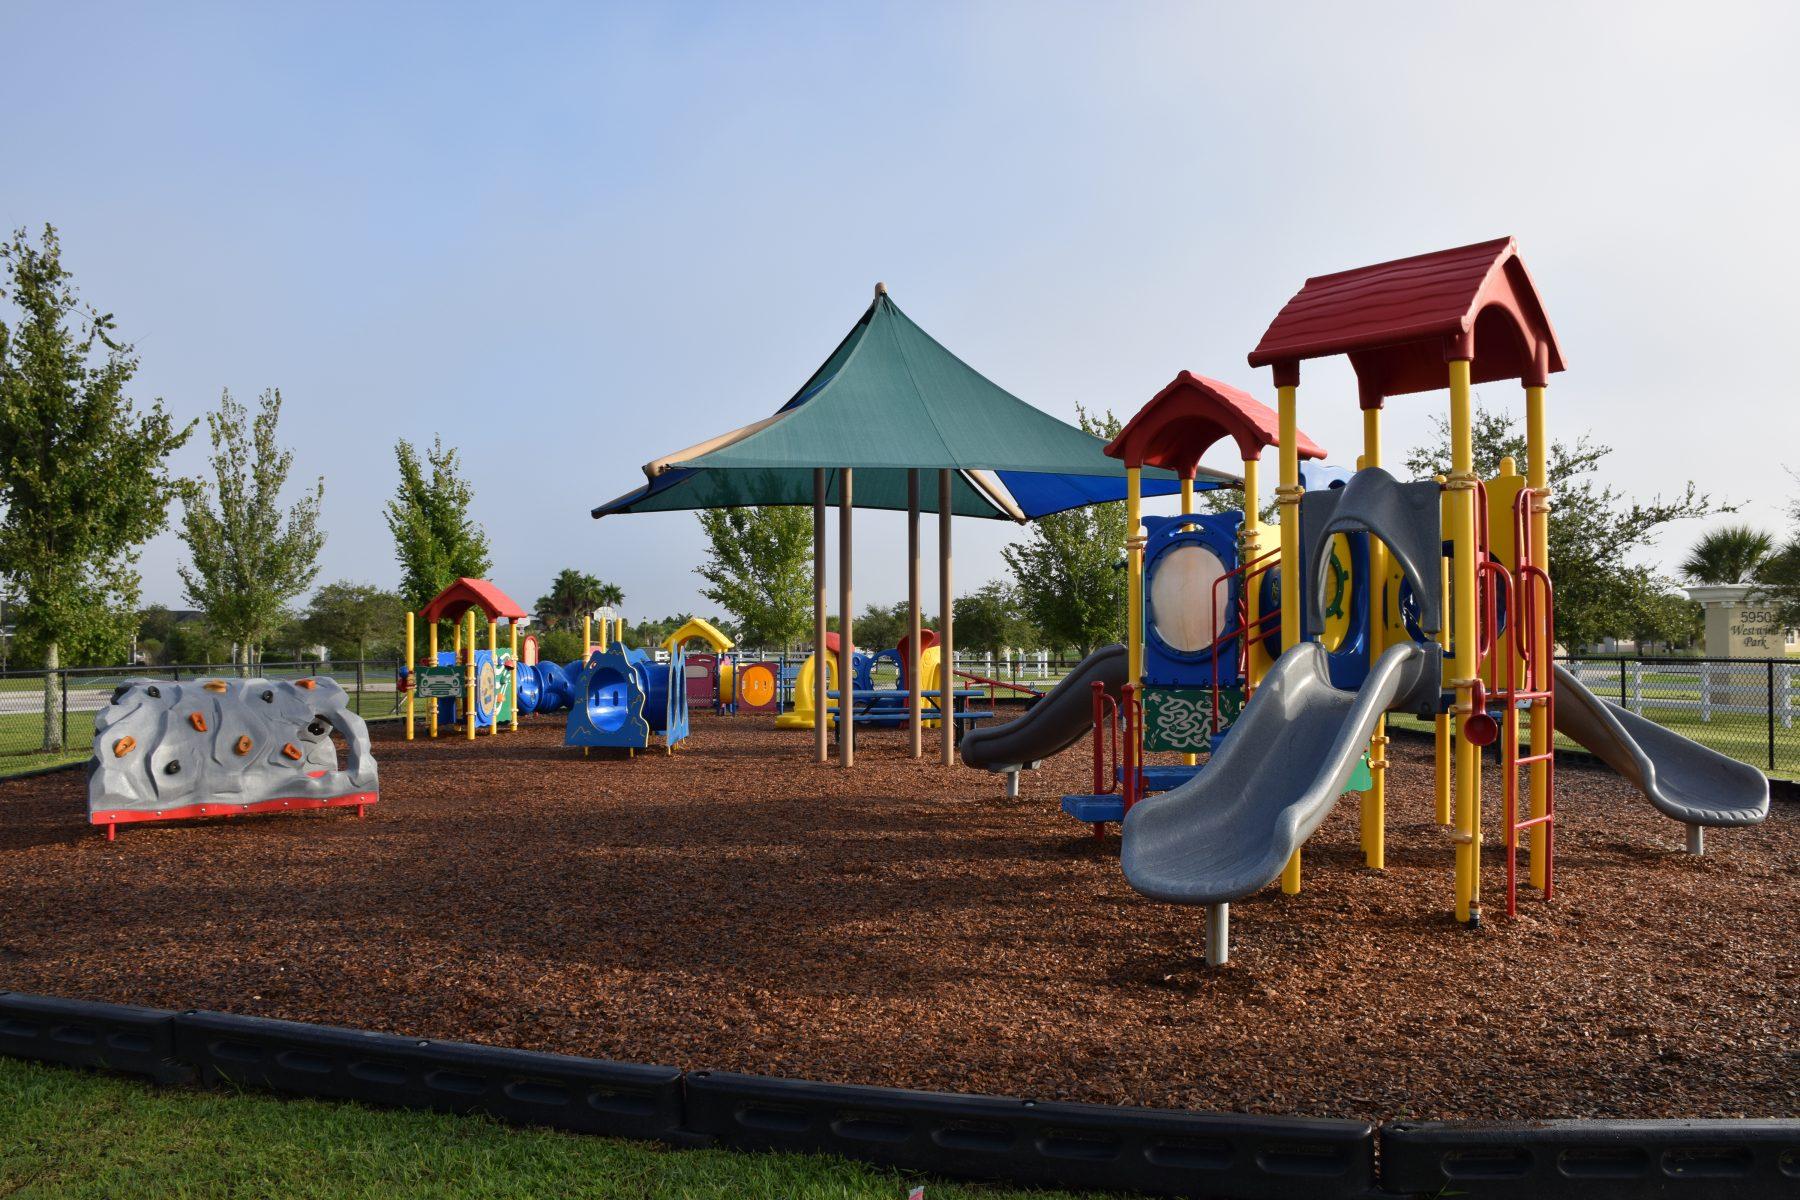 Playground equipment at CVCA parks